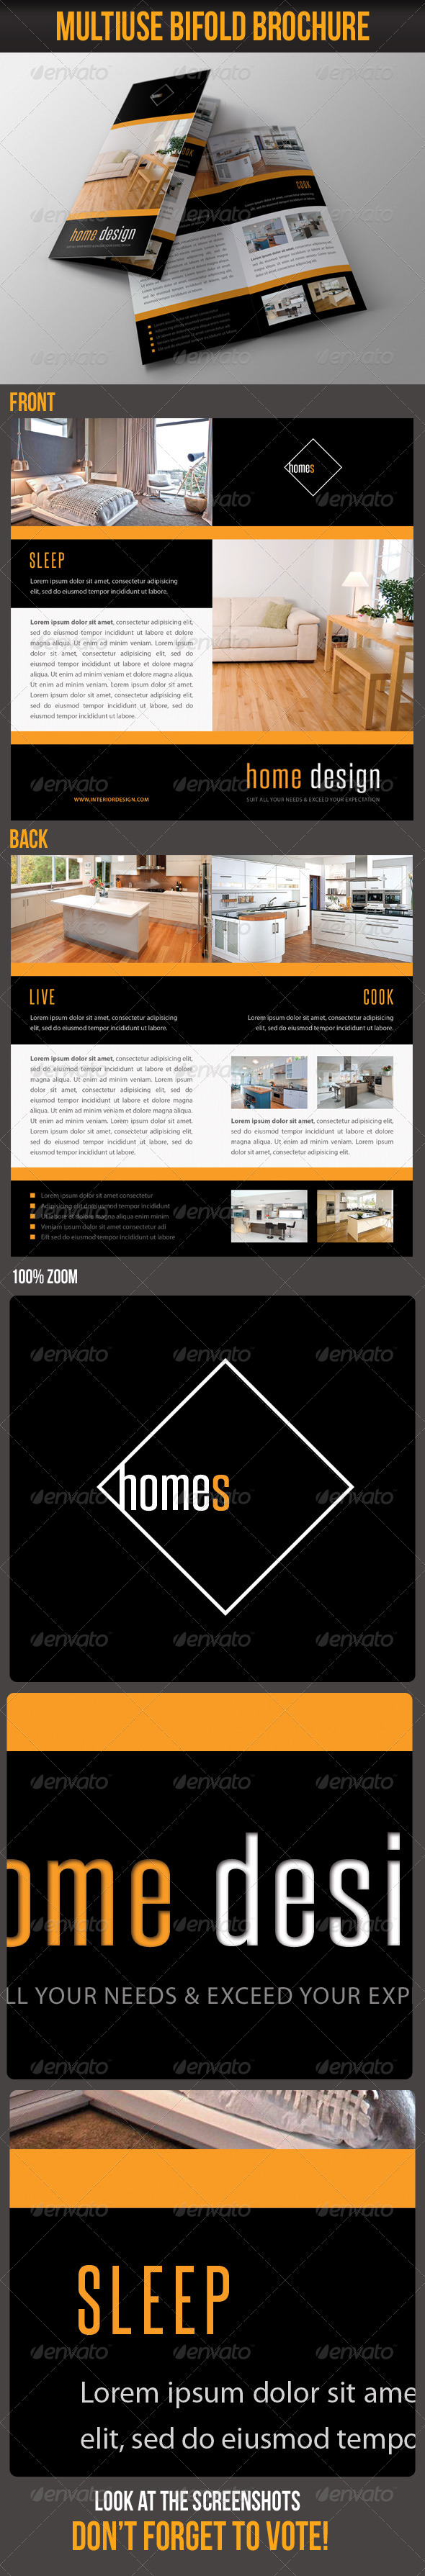 Multiuse Bifold Brochure 55 - Portfolio Brochures